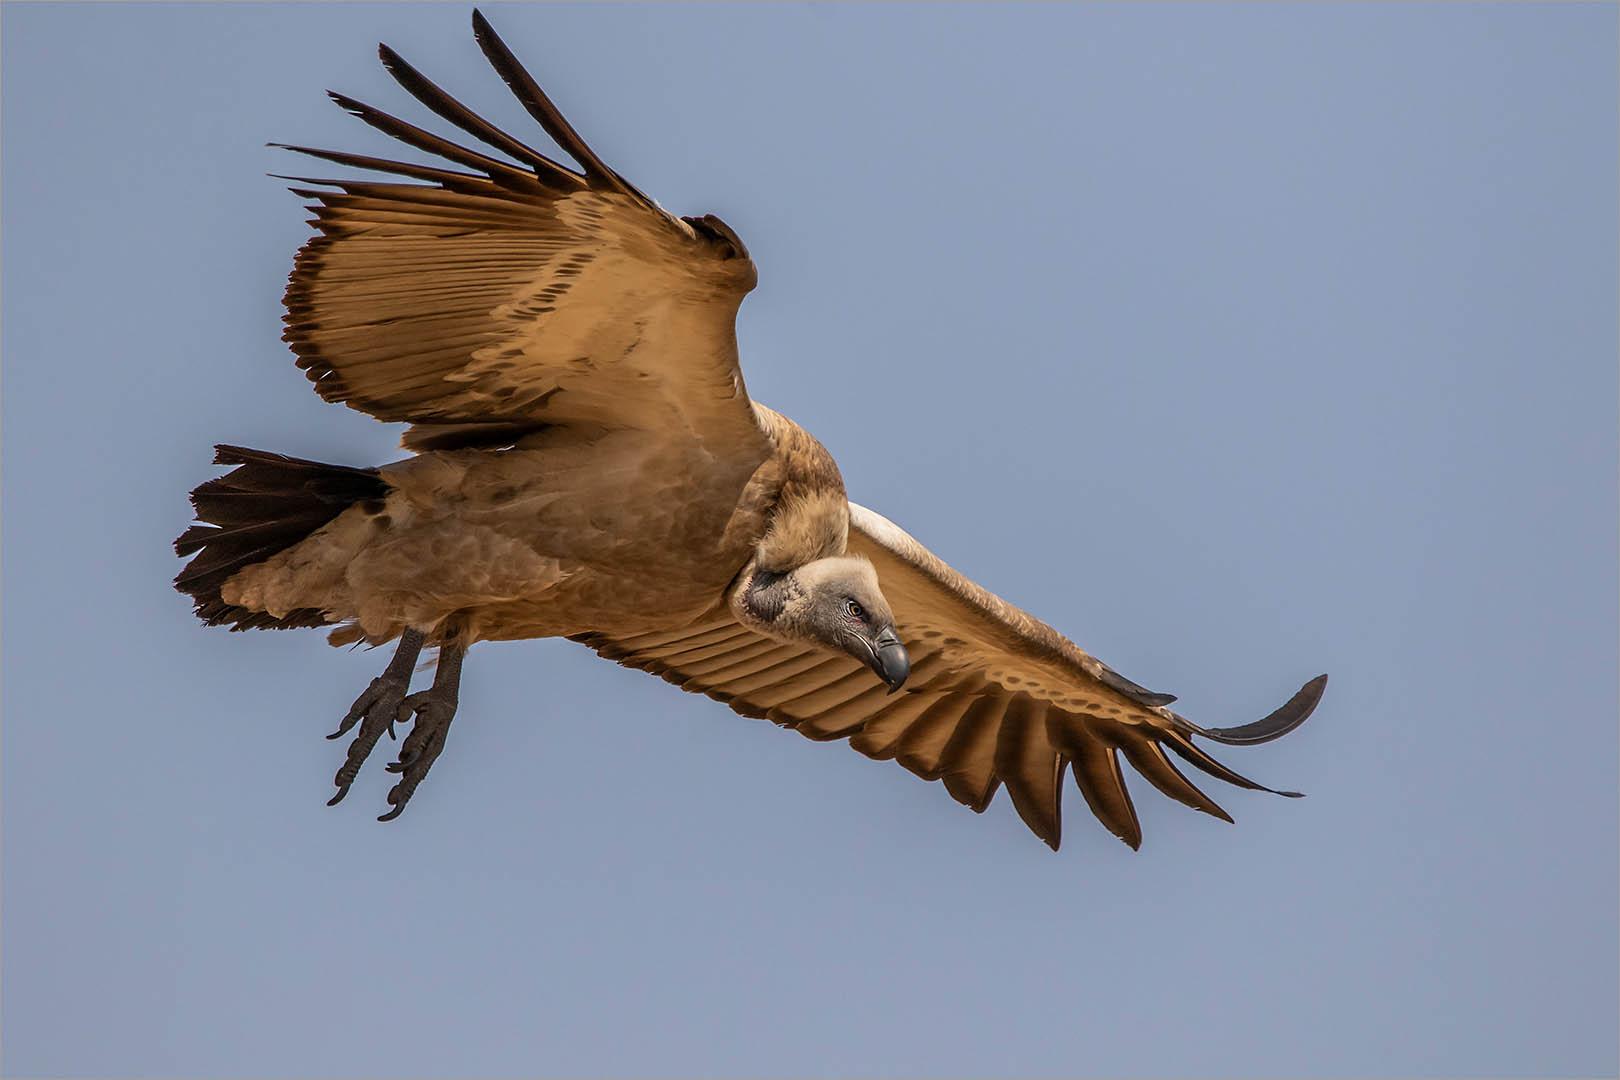 5_NA_Cape Vulture Approach_Ted Kinsman